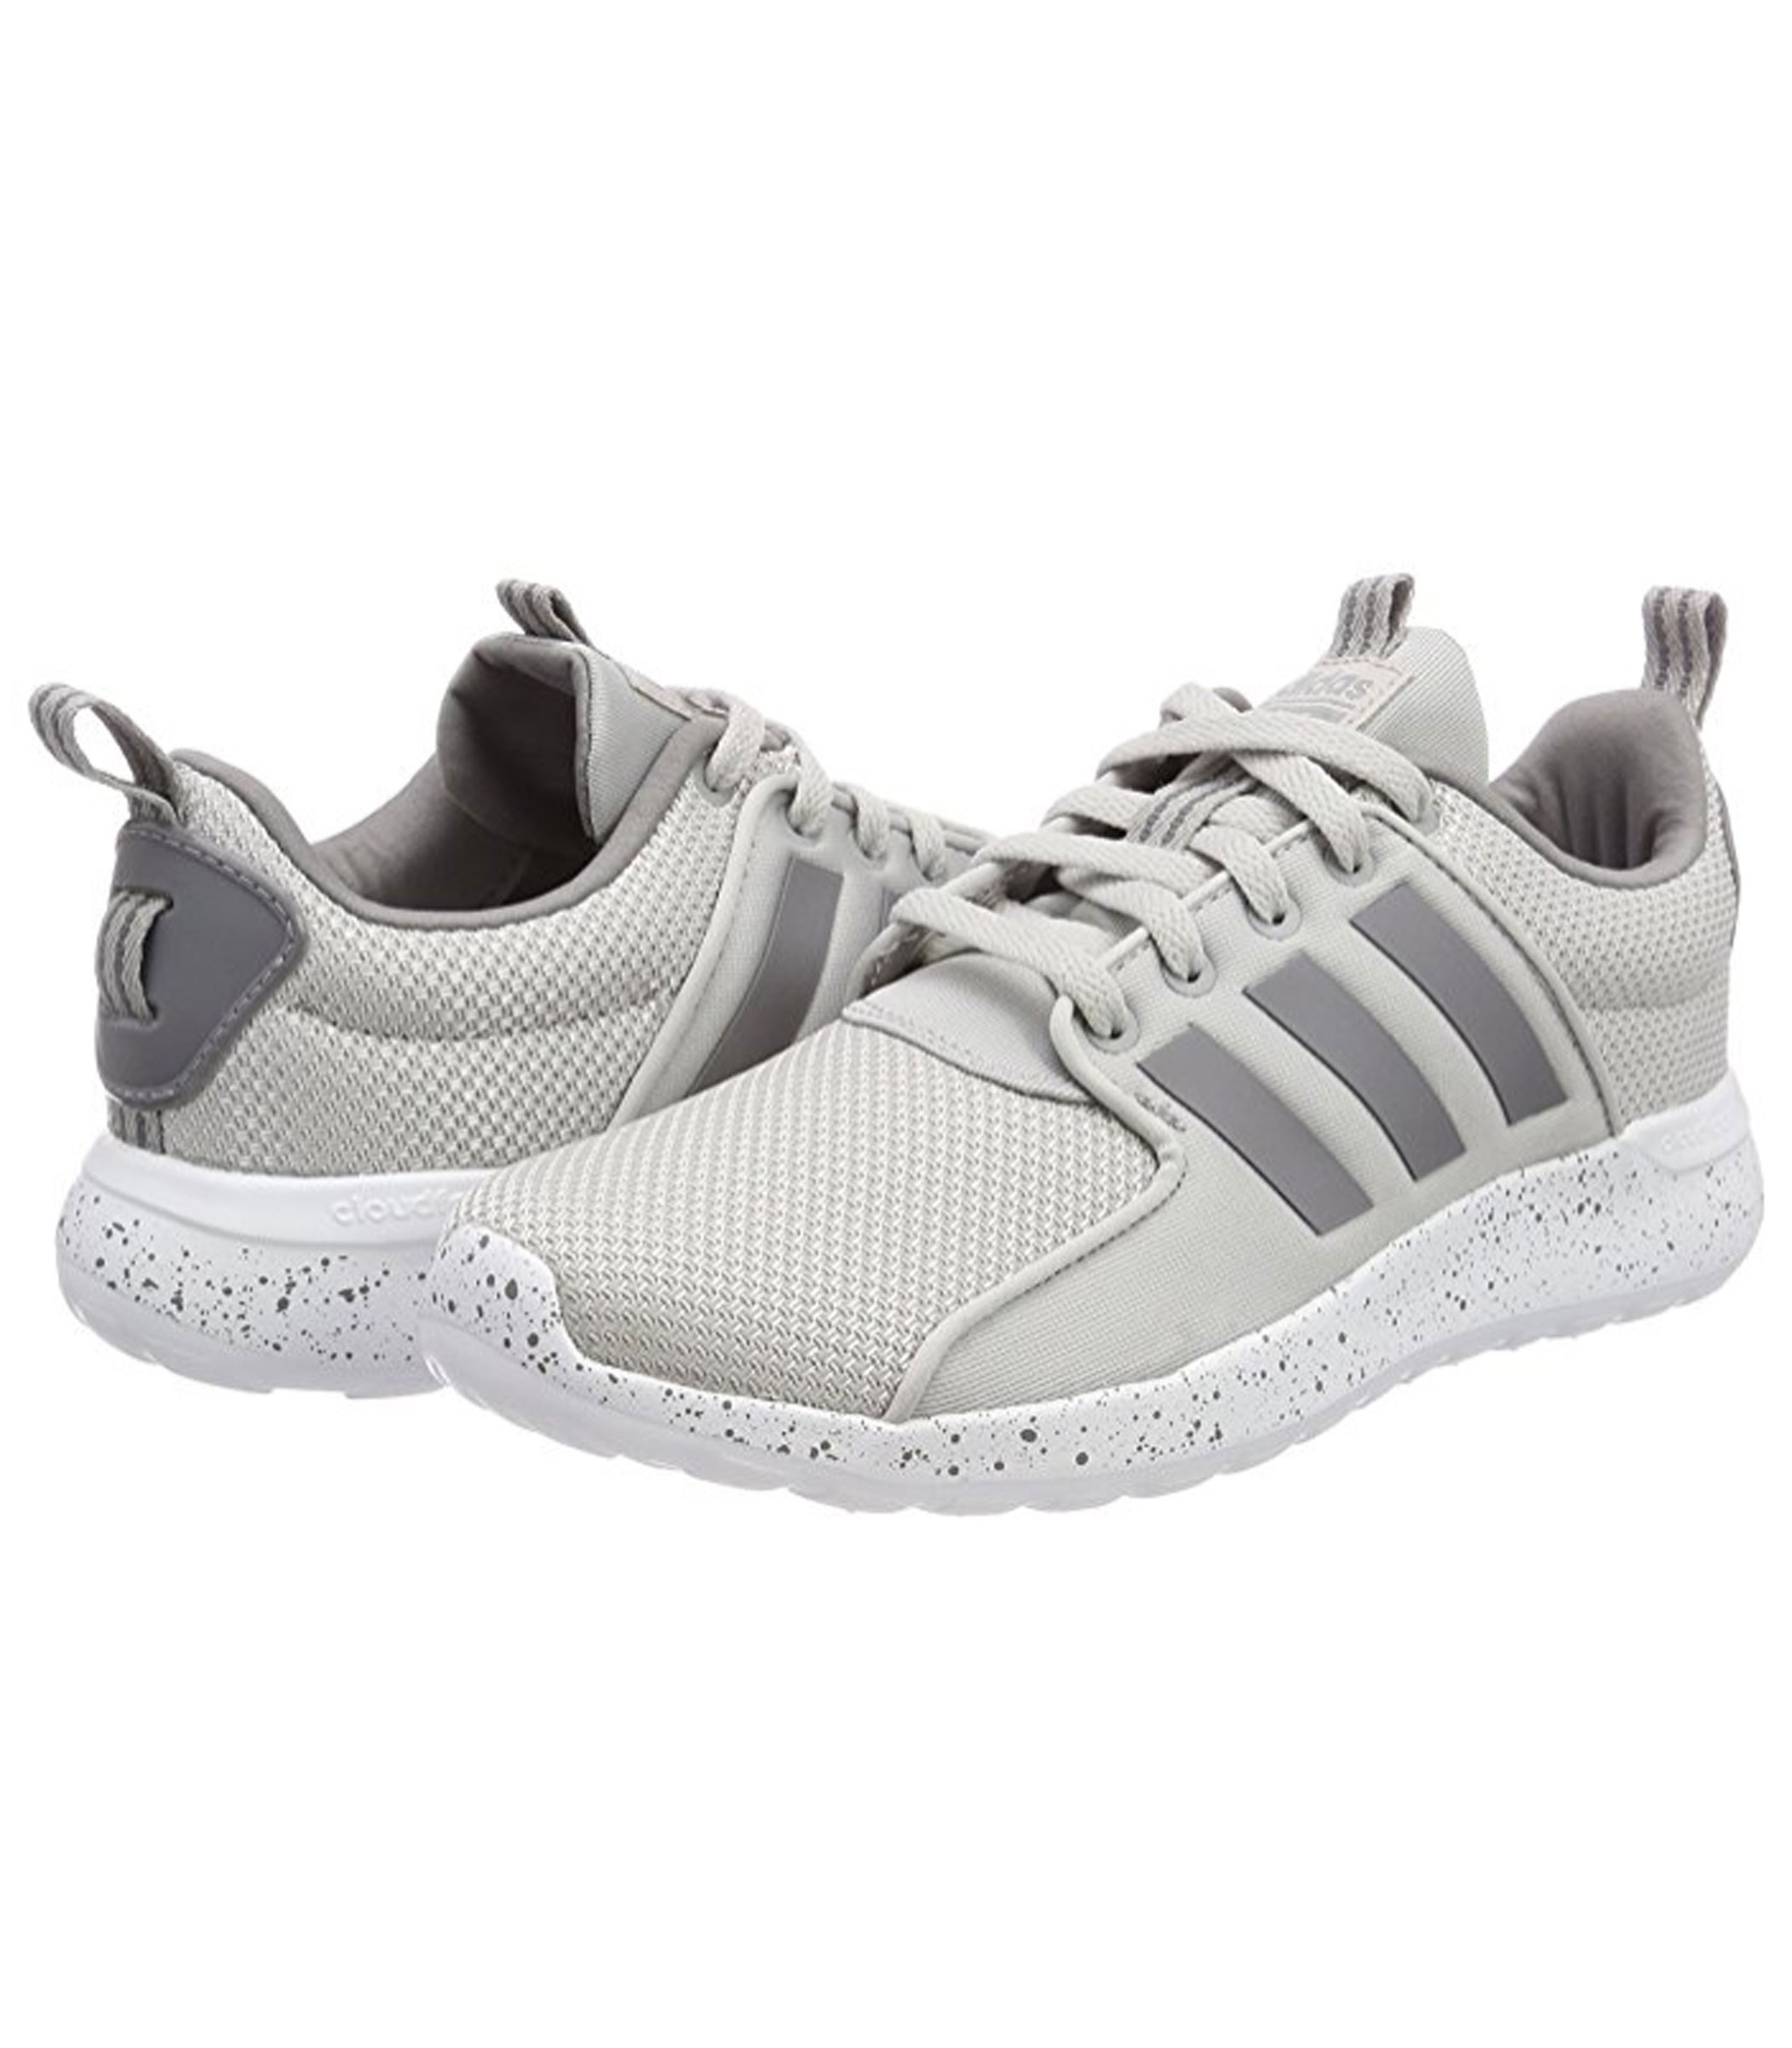 official photos 253c2 c1f1f Scarpe Sneakers Running Adidas CF Cloudfoam Lite Racer rif. DA9840 -  zukunftsfee.info